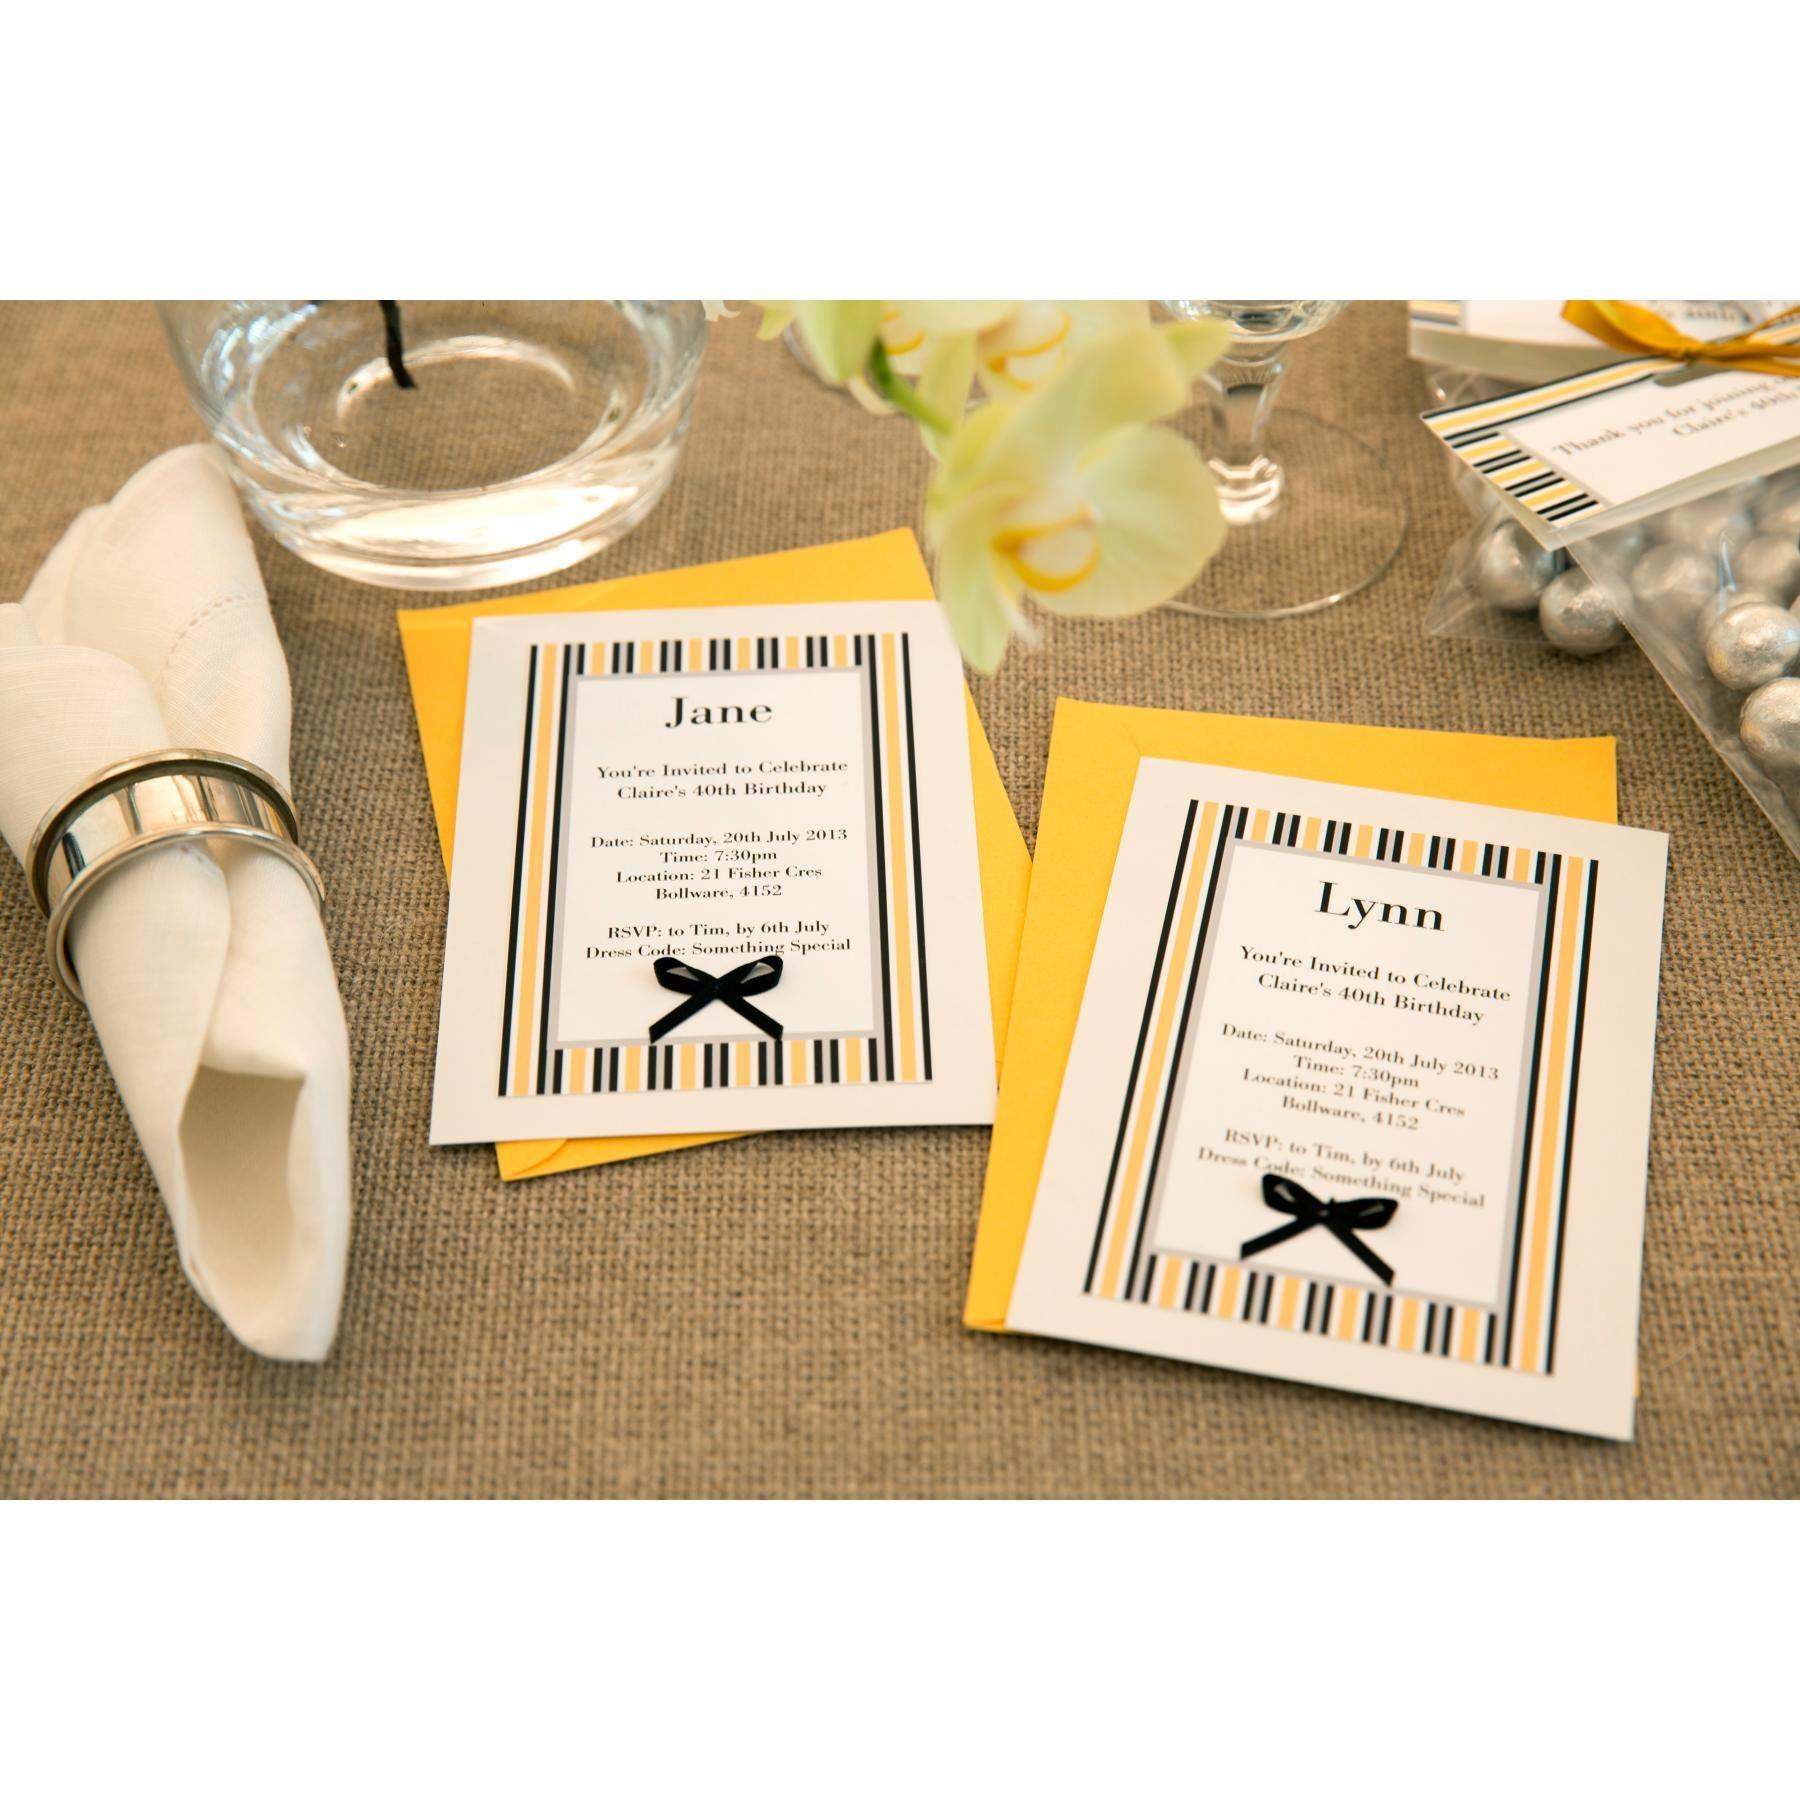 Stylish Handmade Dinner Party Invitations Using Avery Printable